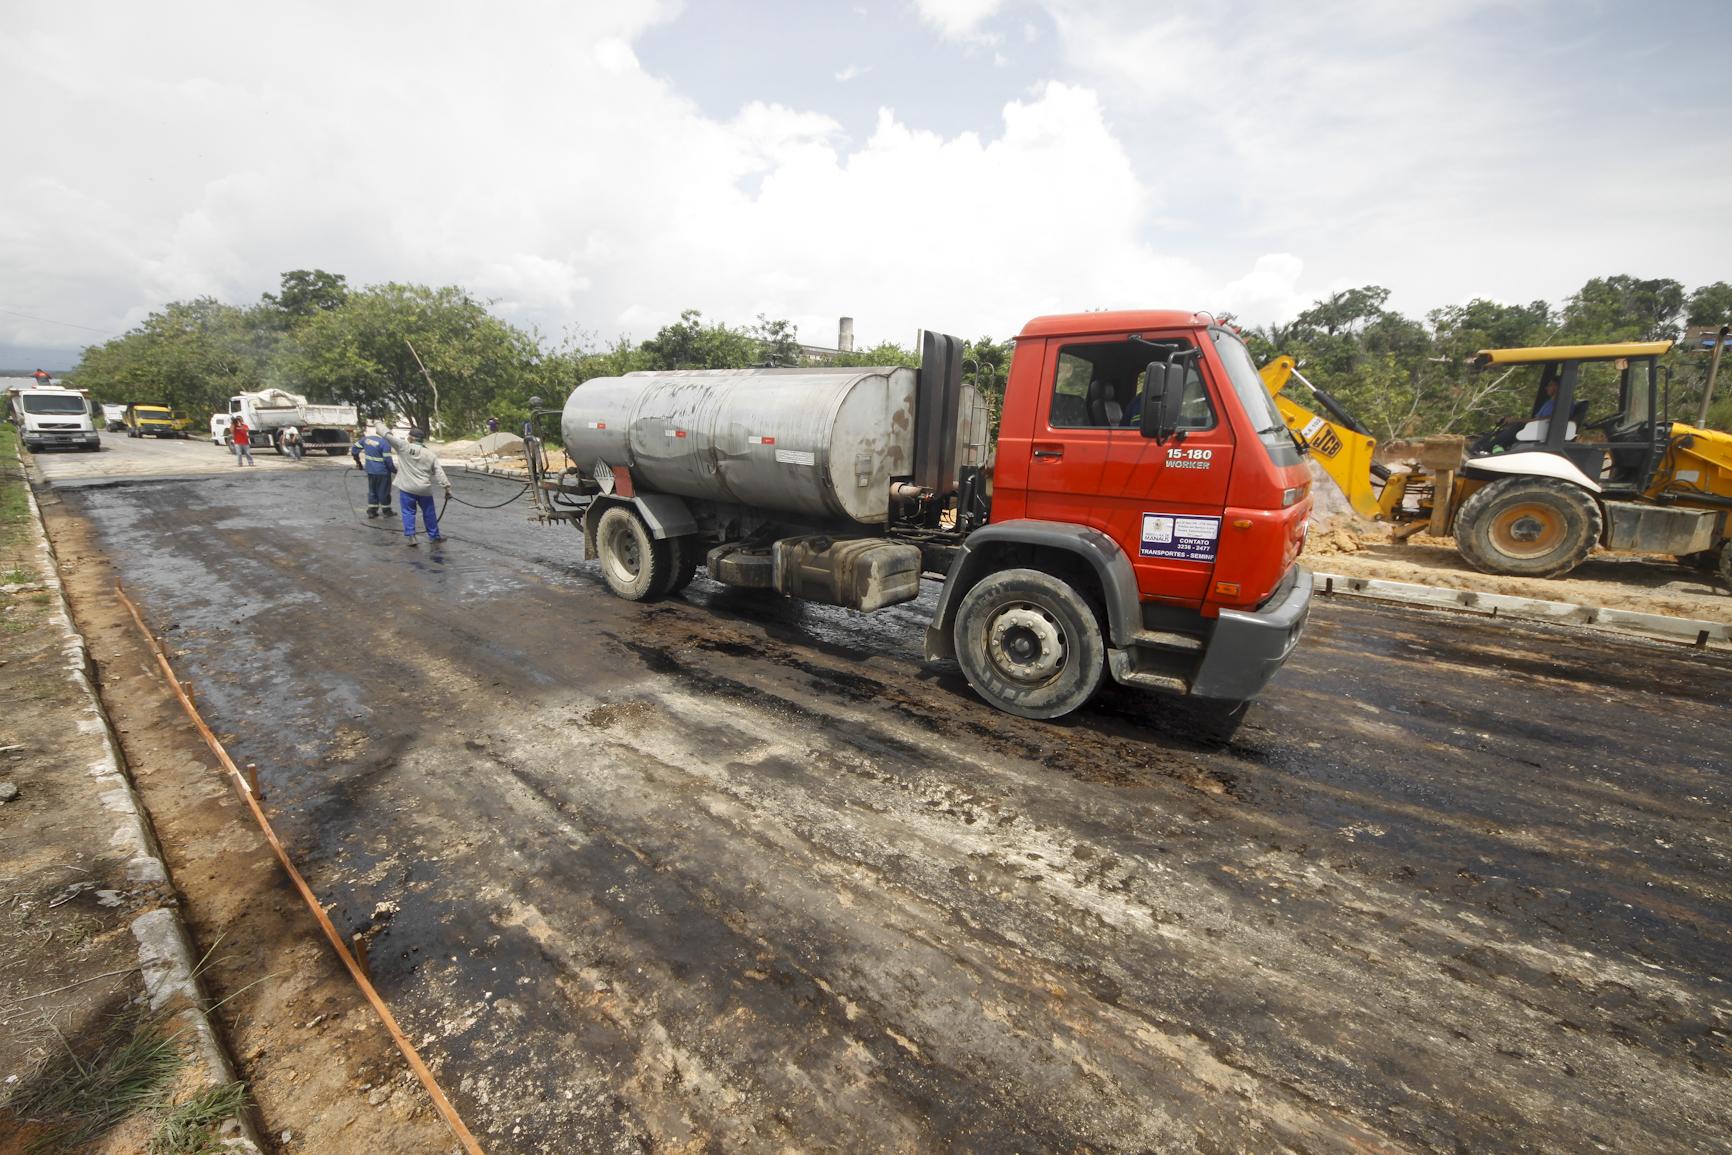 Grilagem na rodovia BR-319: 9 – As falácias do discurso político